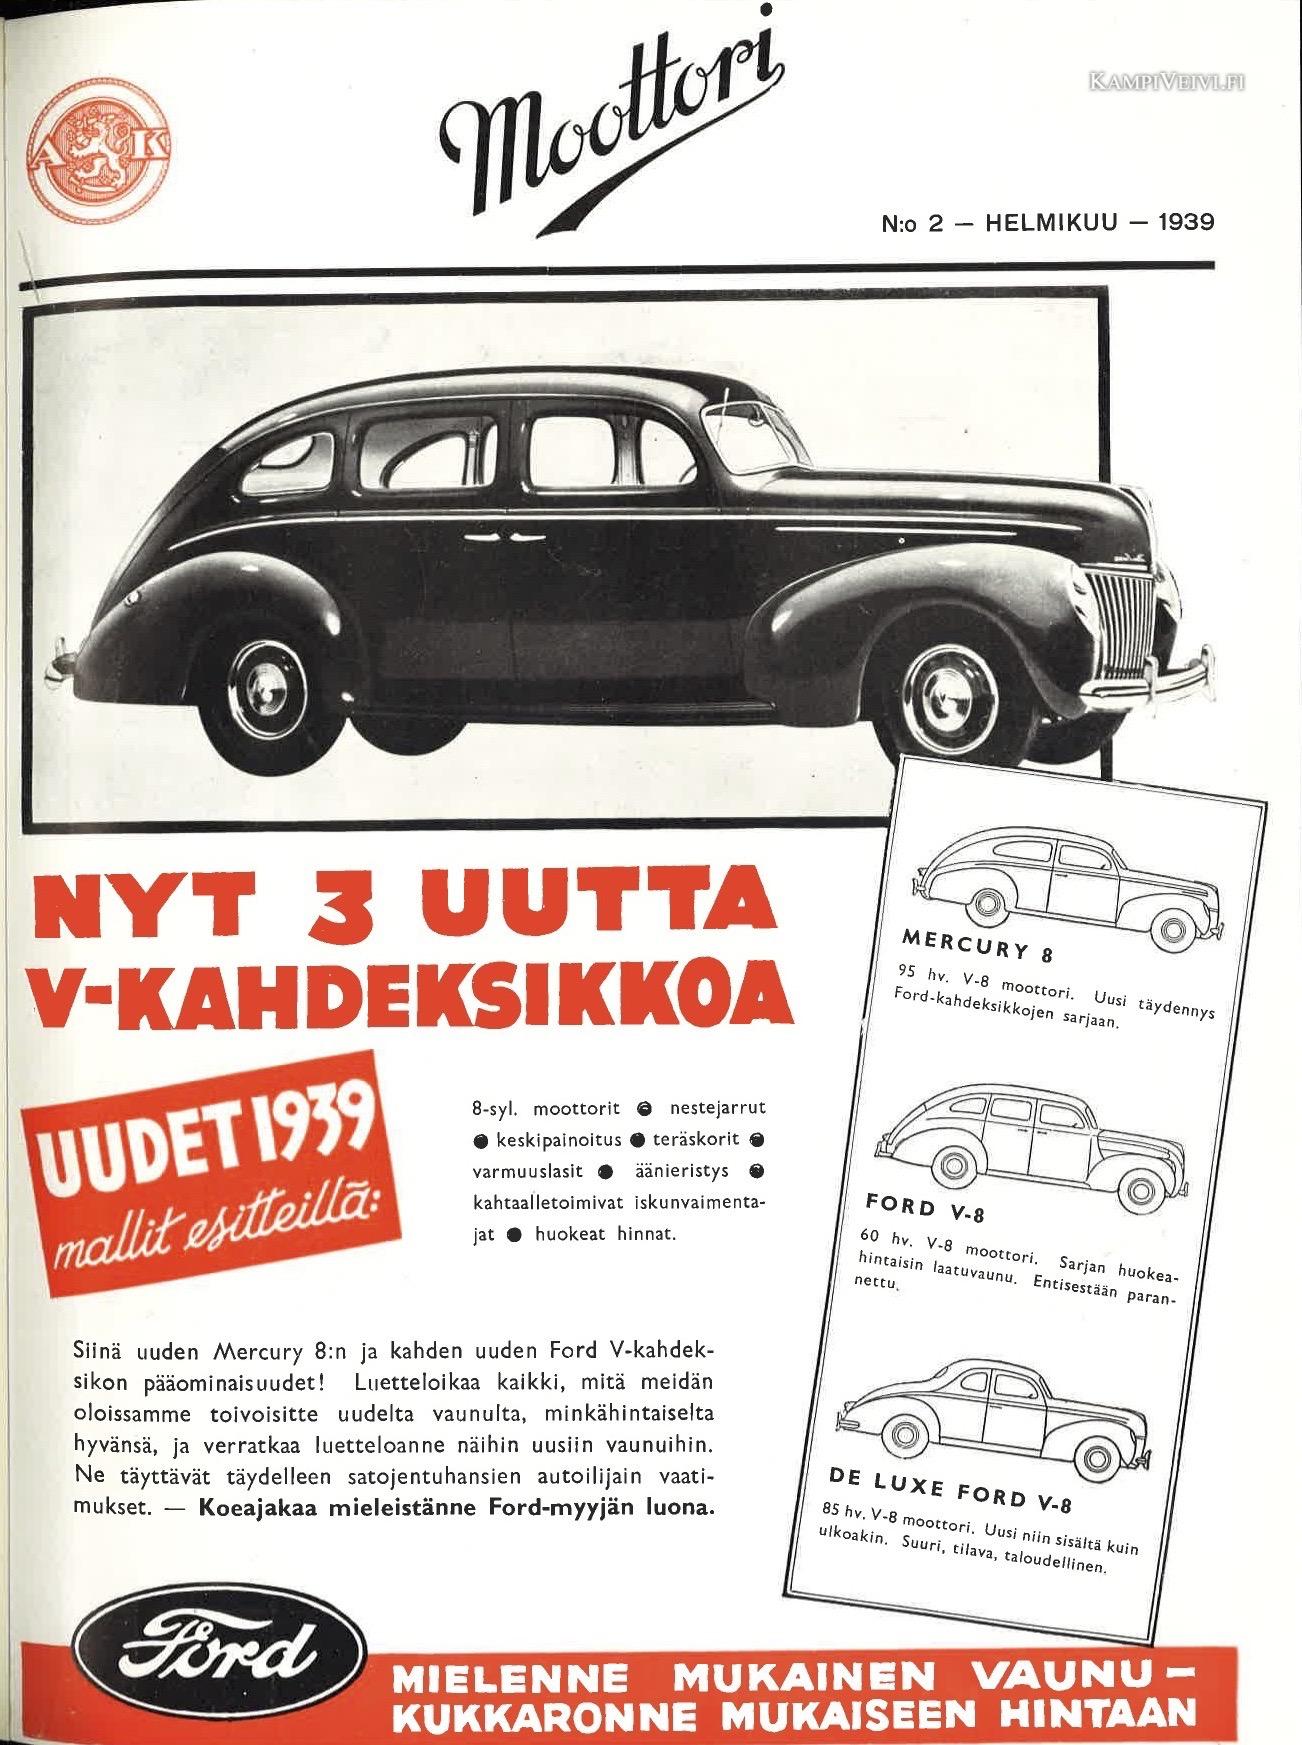 1939FordDeluxe-moottori